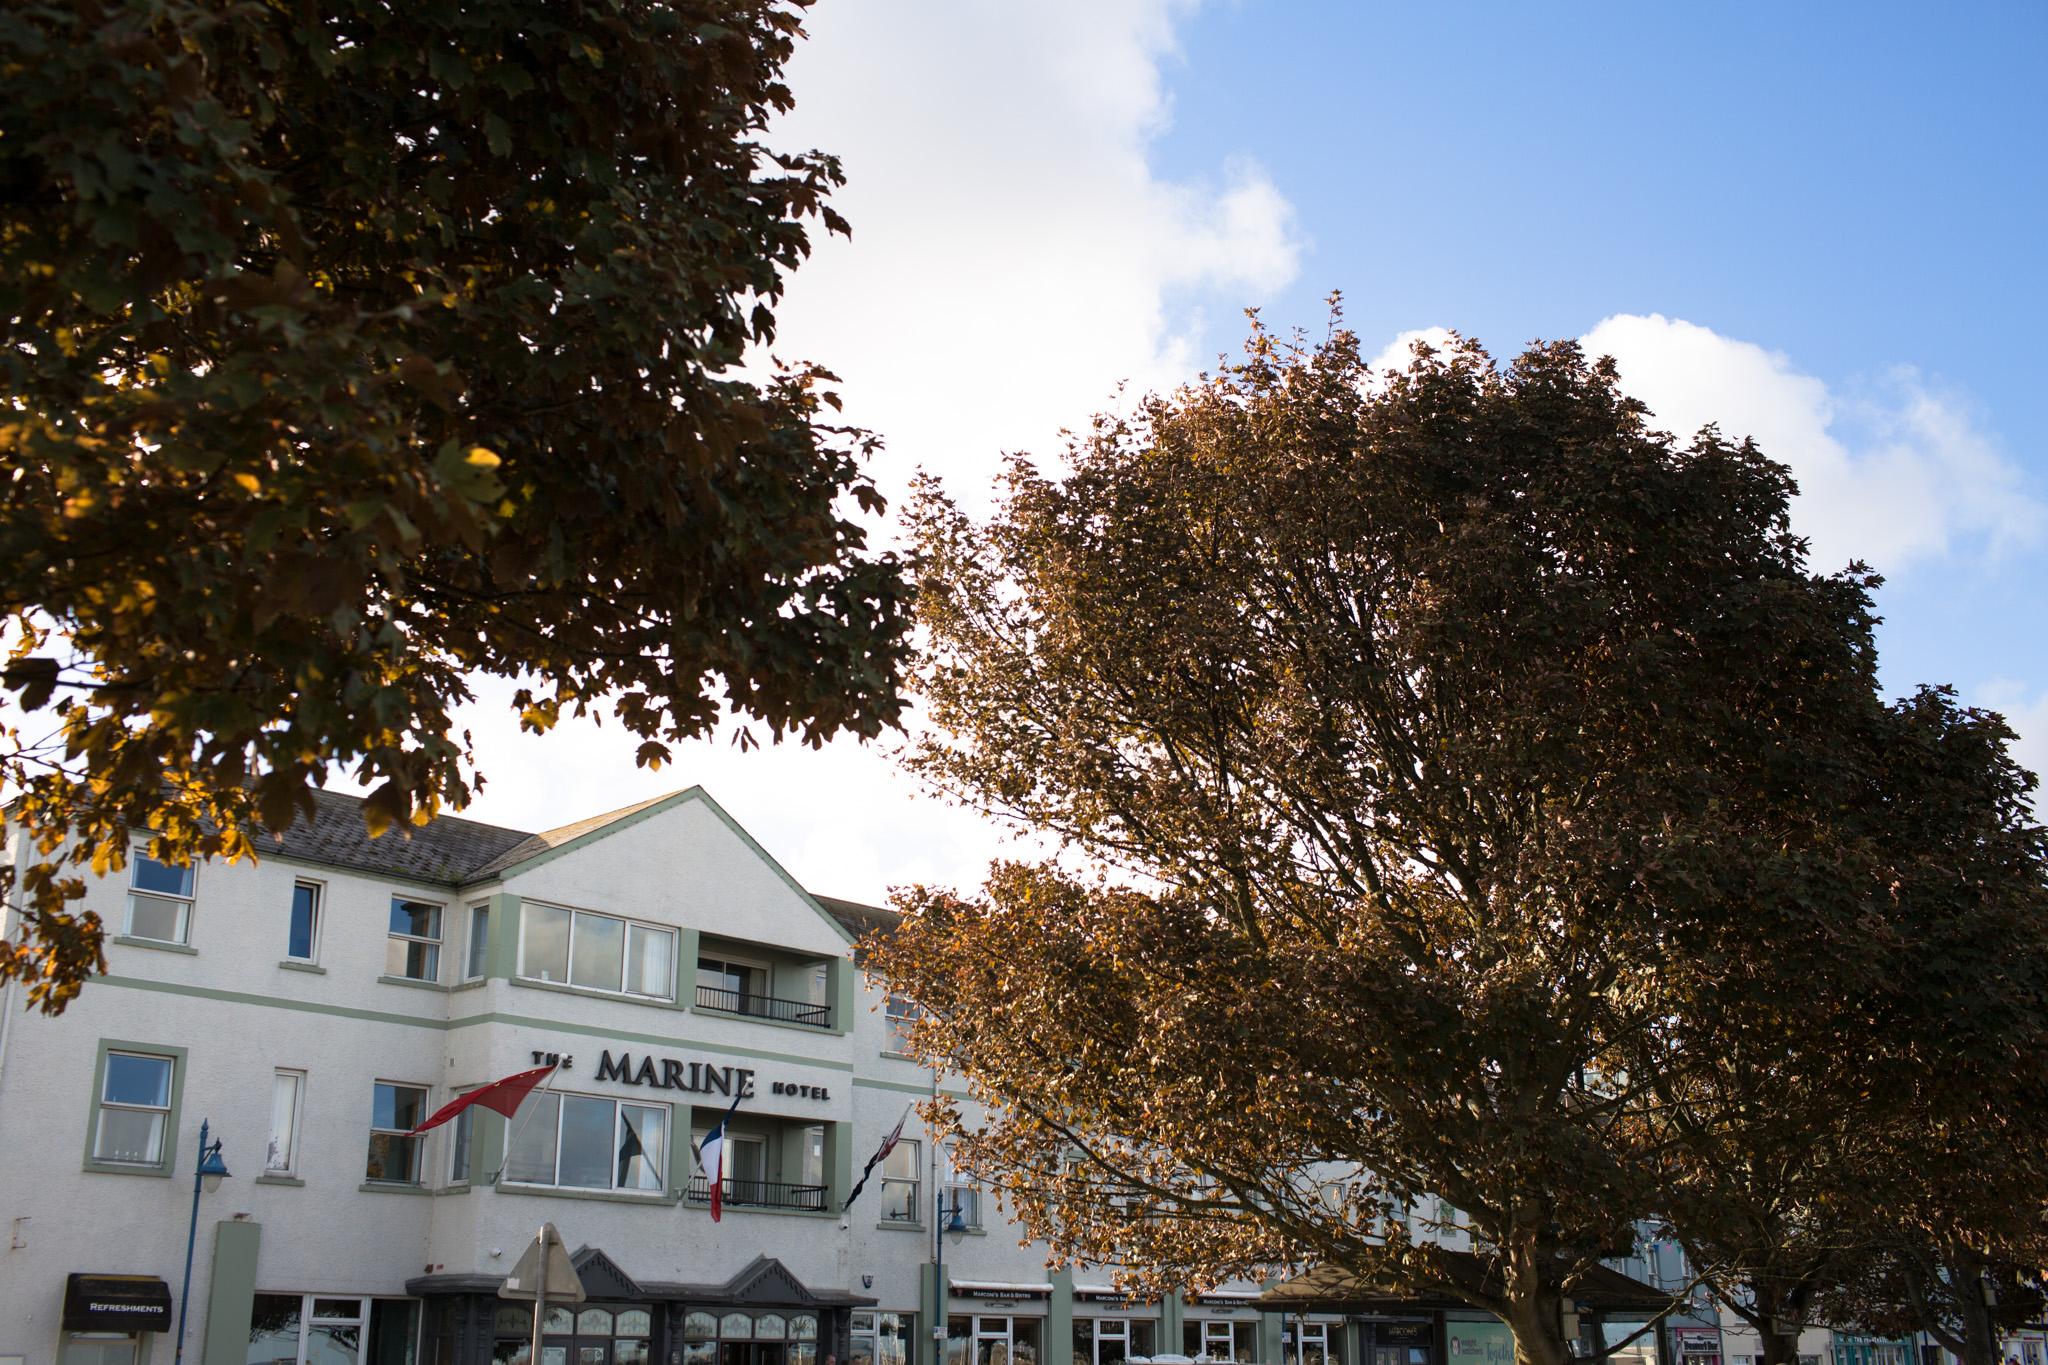 Mark_Barnes_Northern_Ireland_Wedding_Photography_Marine_hotel_ballycastle_Wedding_Photography_Janet&Darren-29.jpg